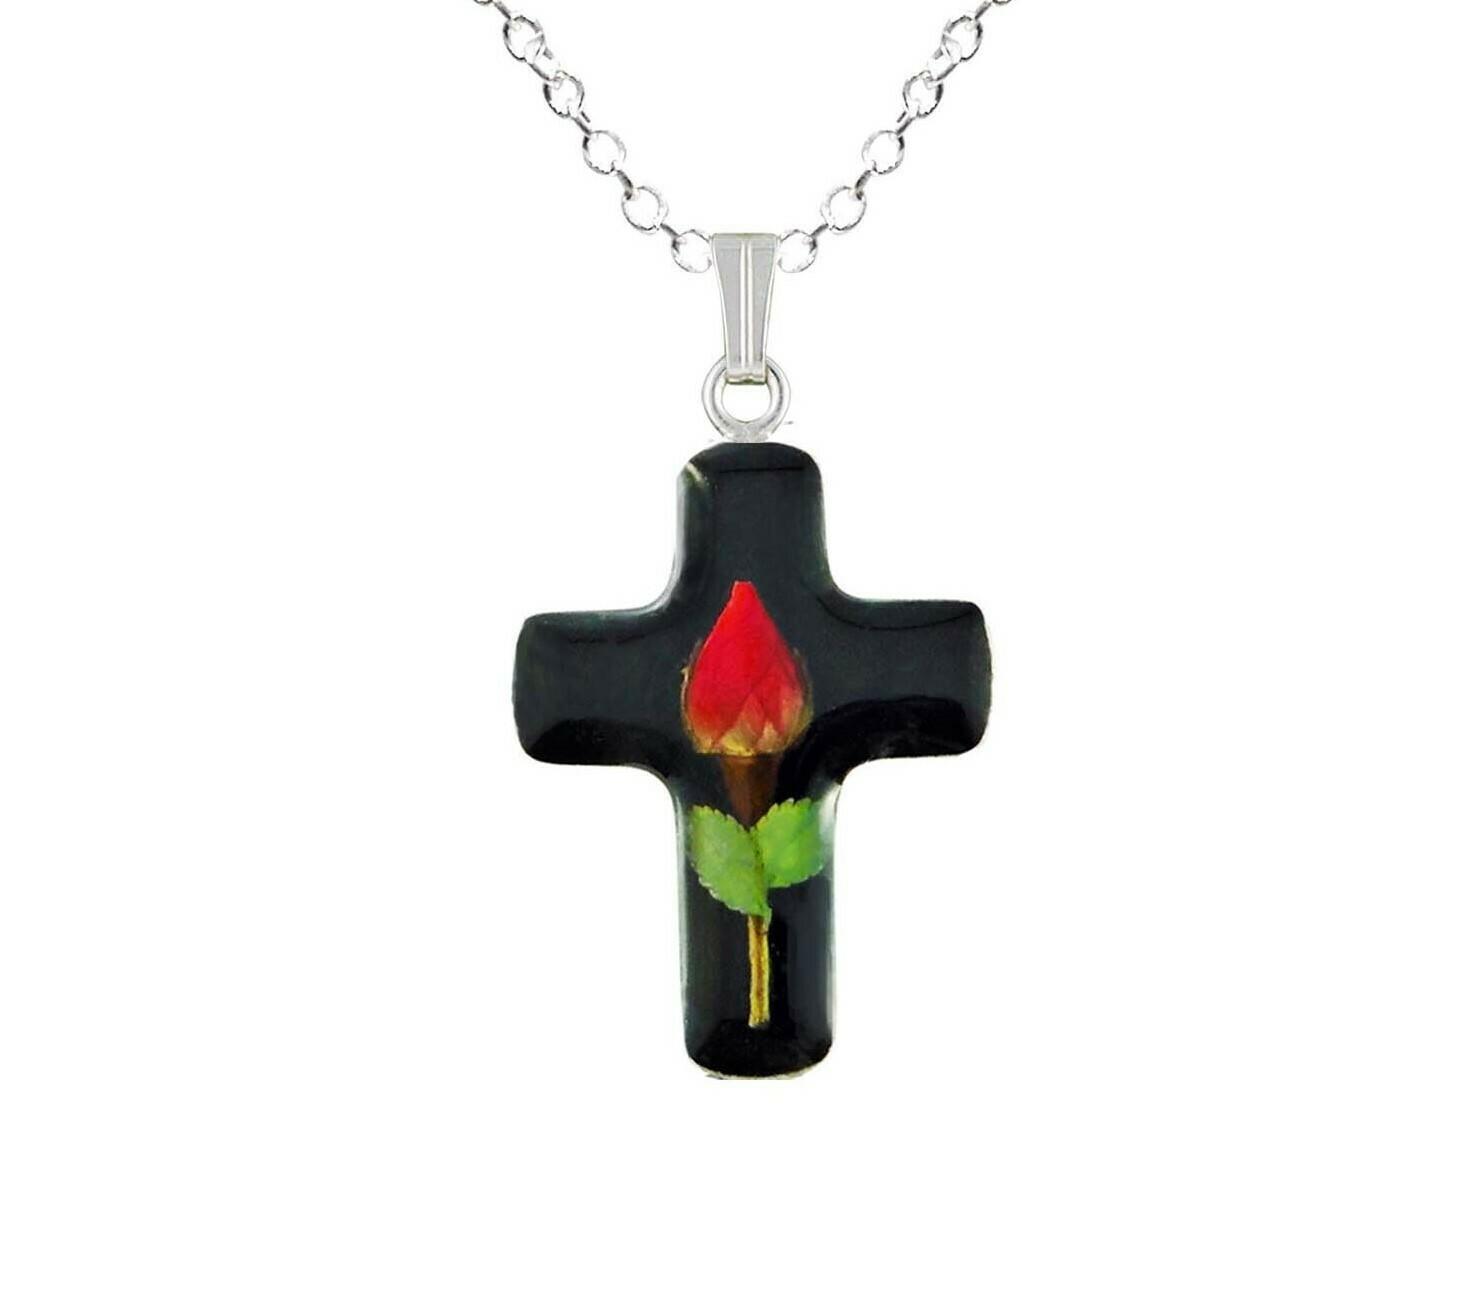 Rose Necklace, Medium Cross, Black background